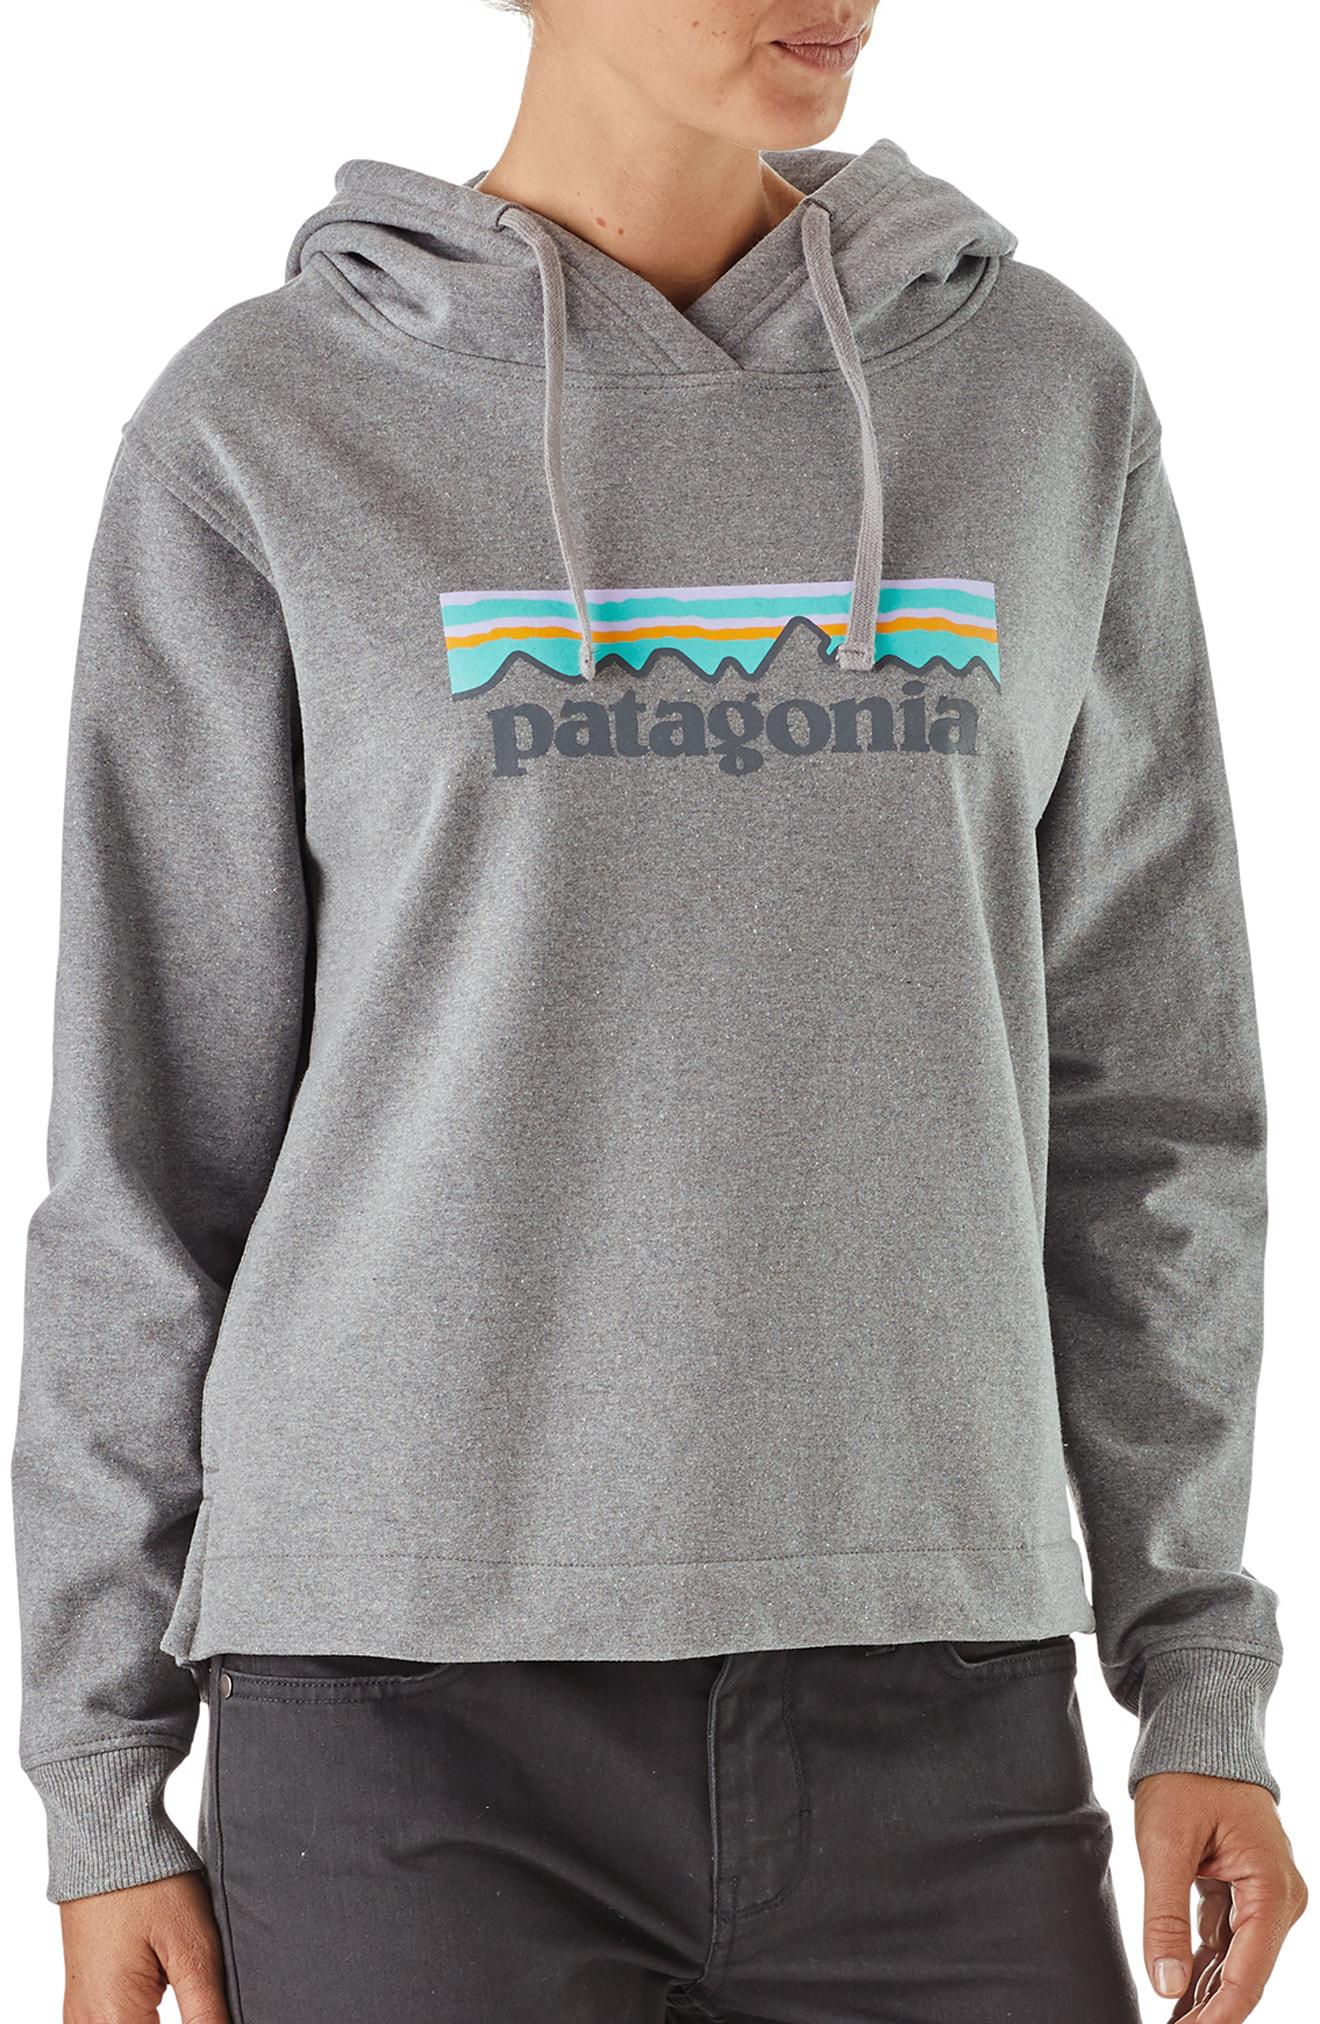 Patagonia P-6 Logo Uprisal Hoodie In Glh Gravel Heather